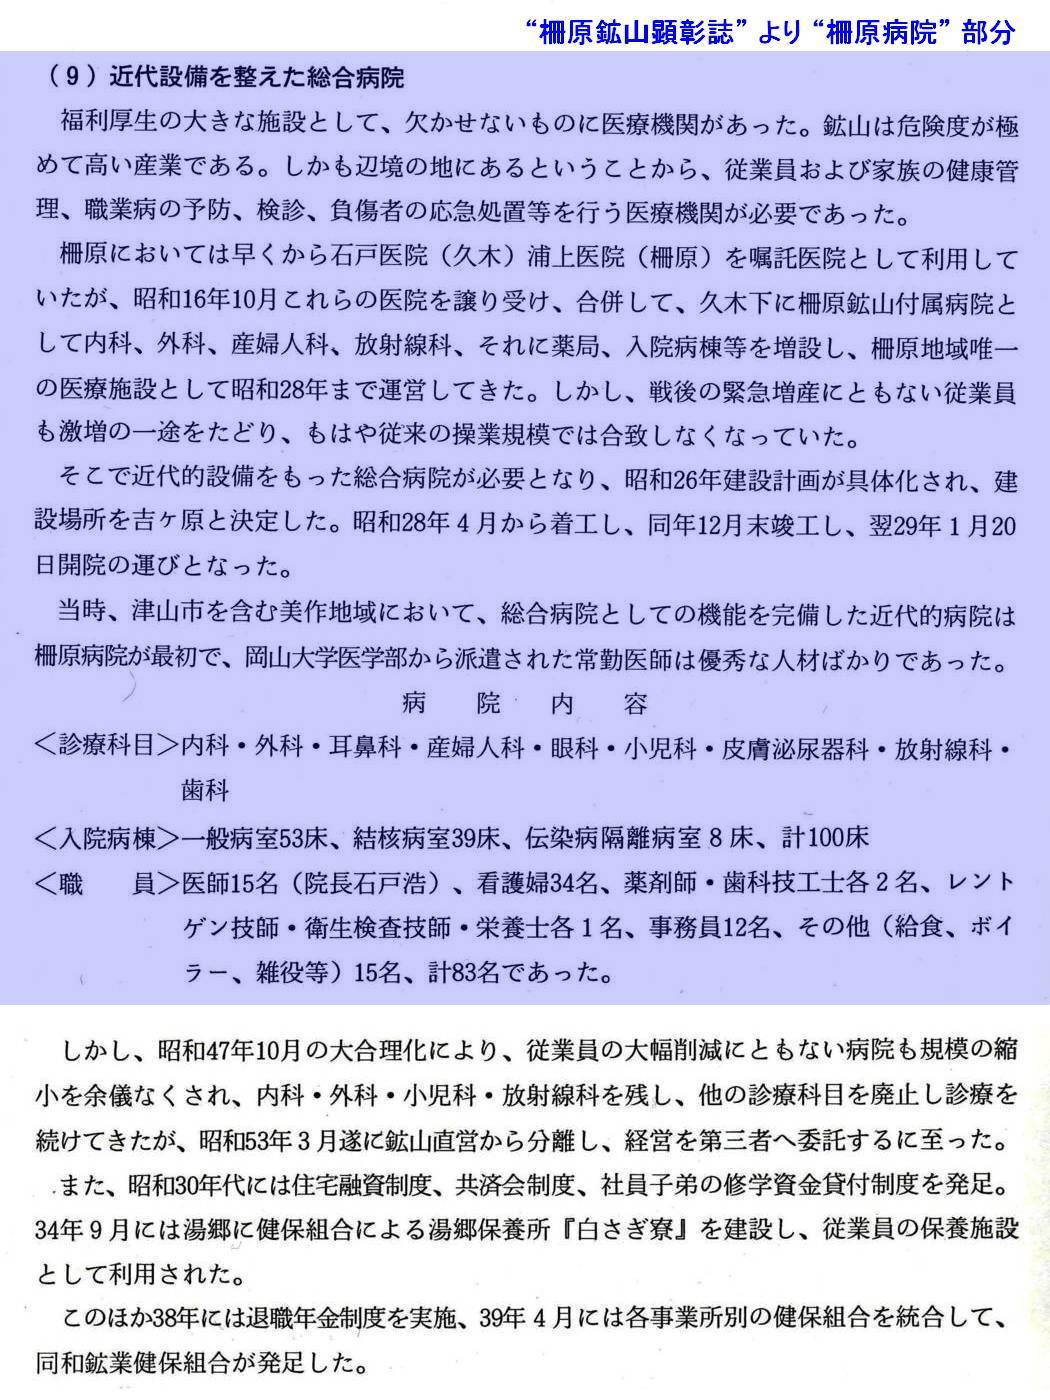 FC0746-02.jpg